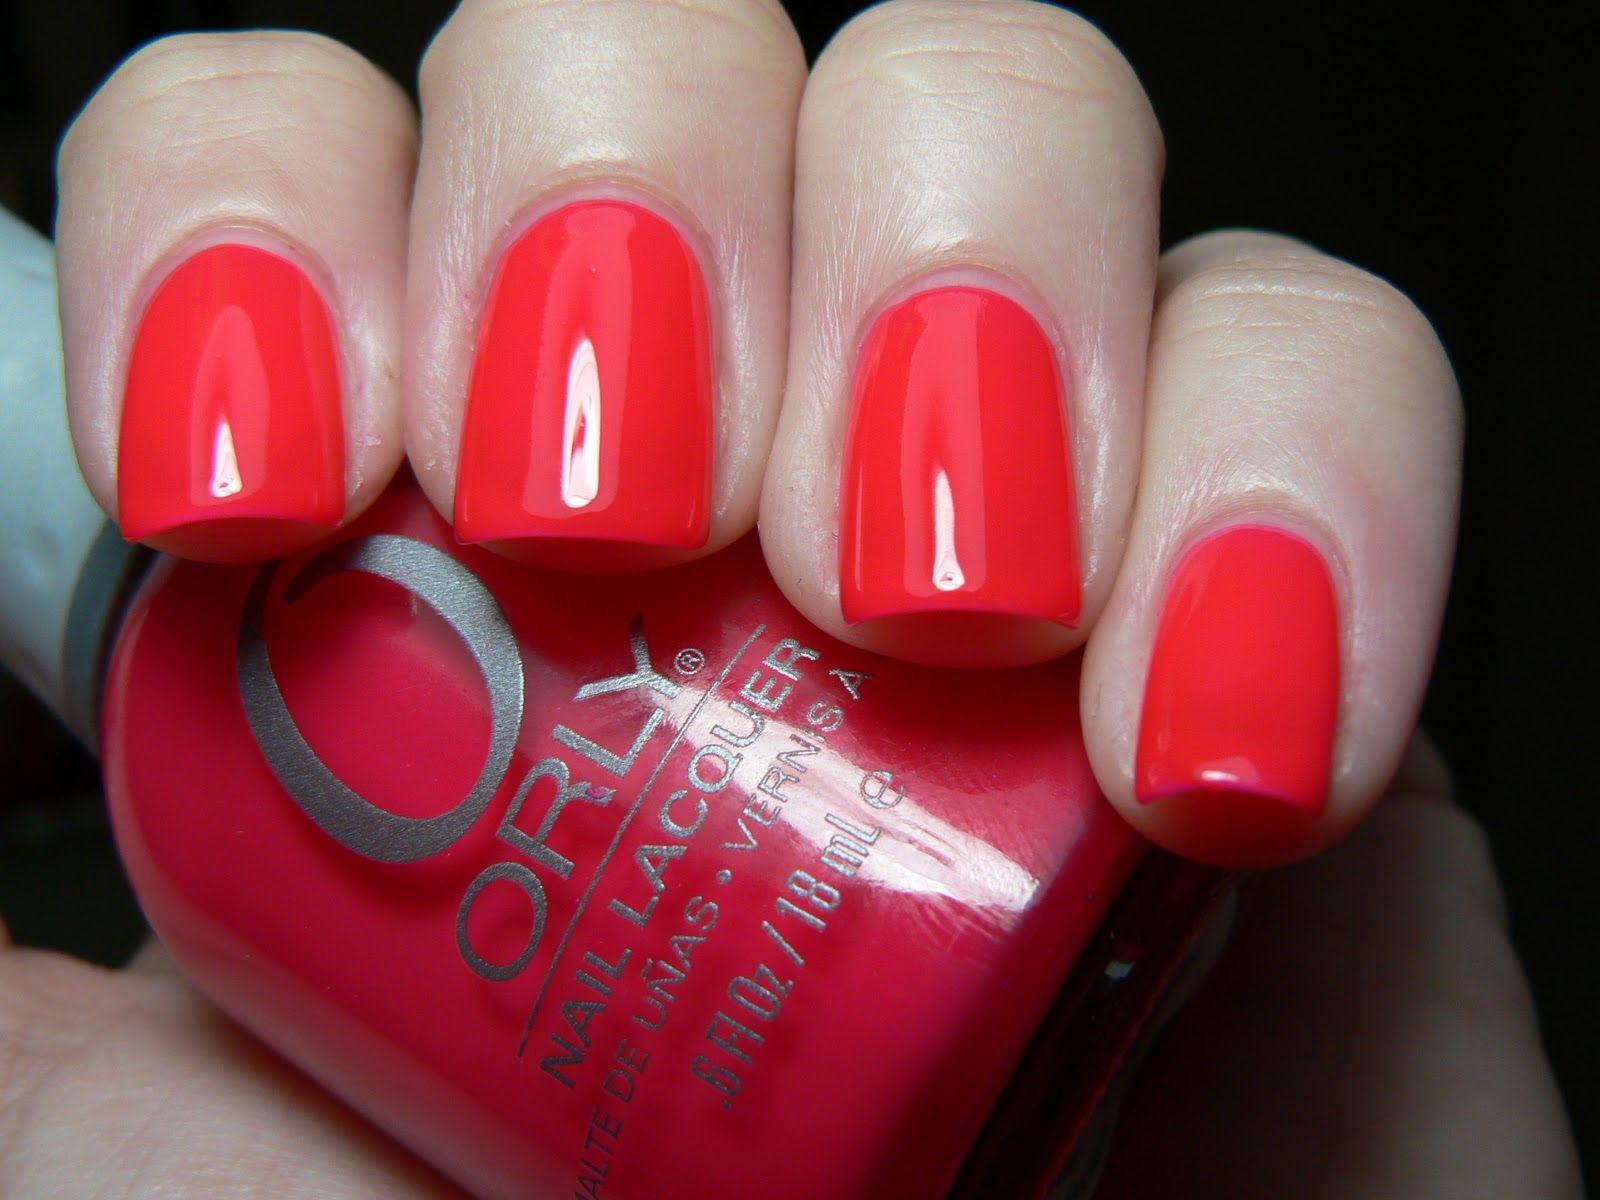 Orly Passion Fruit Black Shatter Nail Polish Beauty Nails